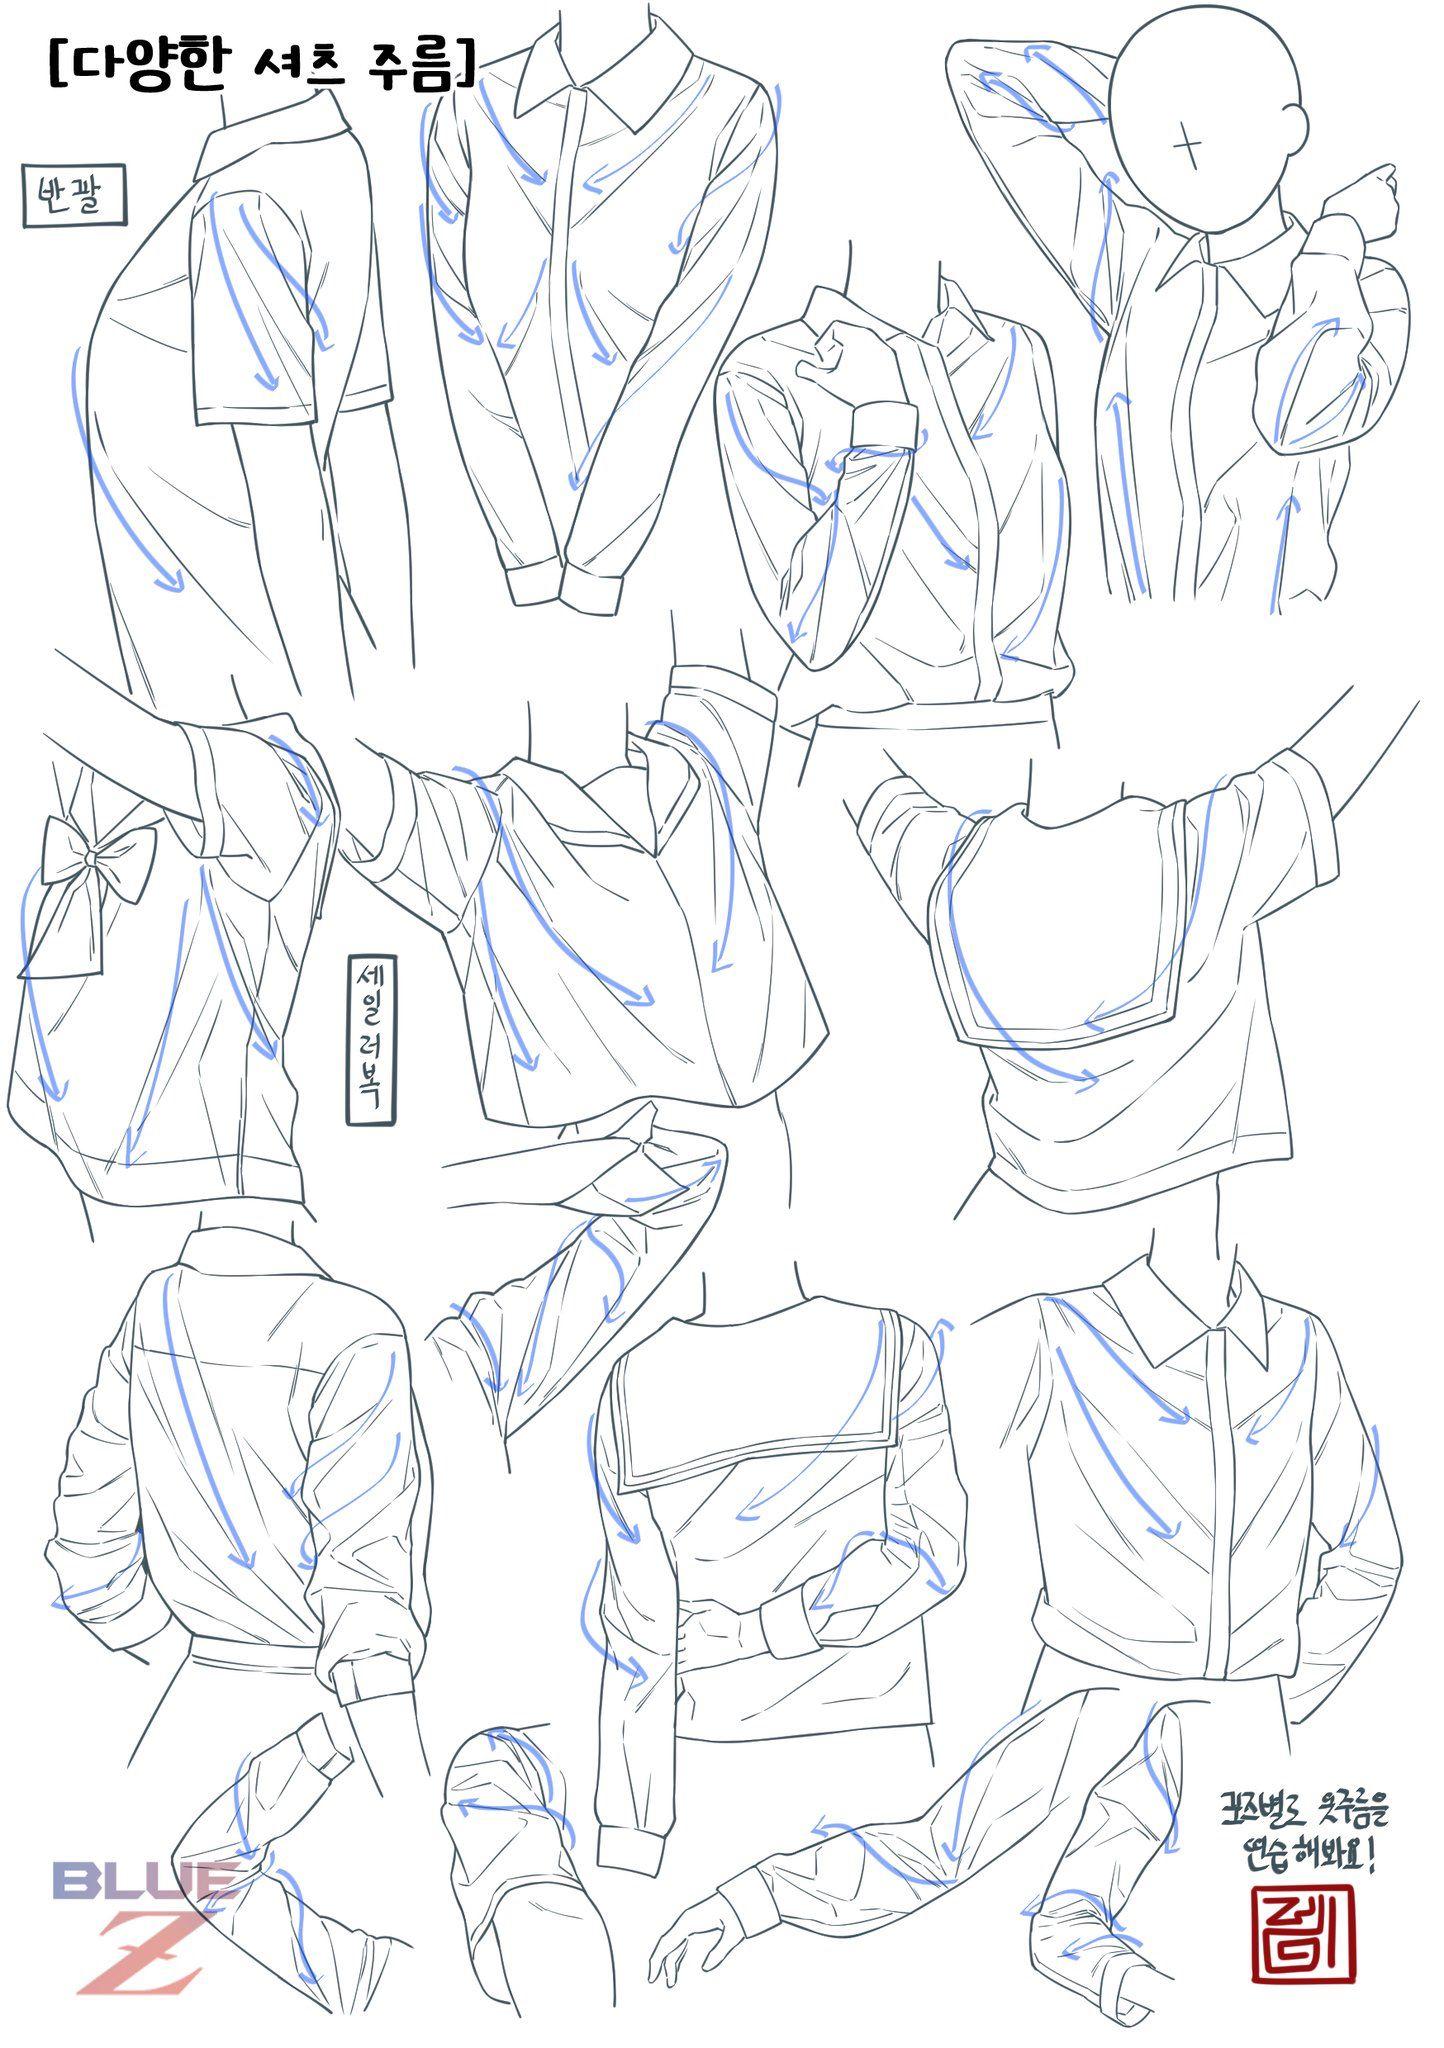 Pin By Shinya Kou On Art Anime Drawings Tutorials Art Reference Photos Drawings